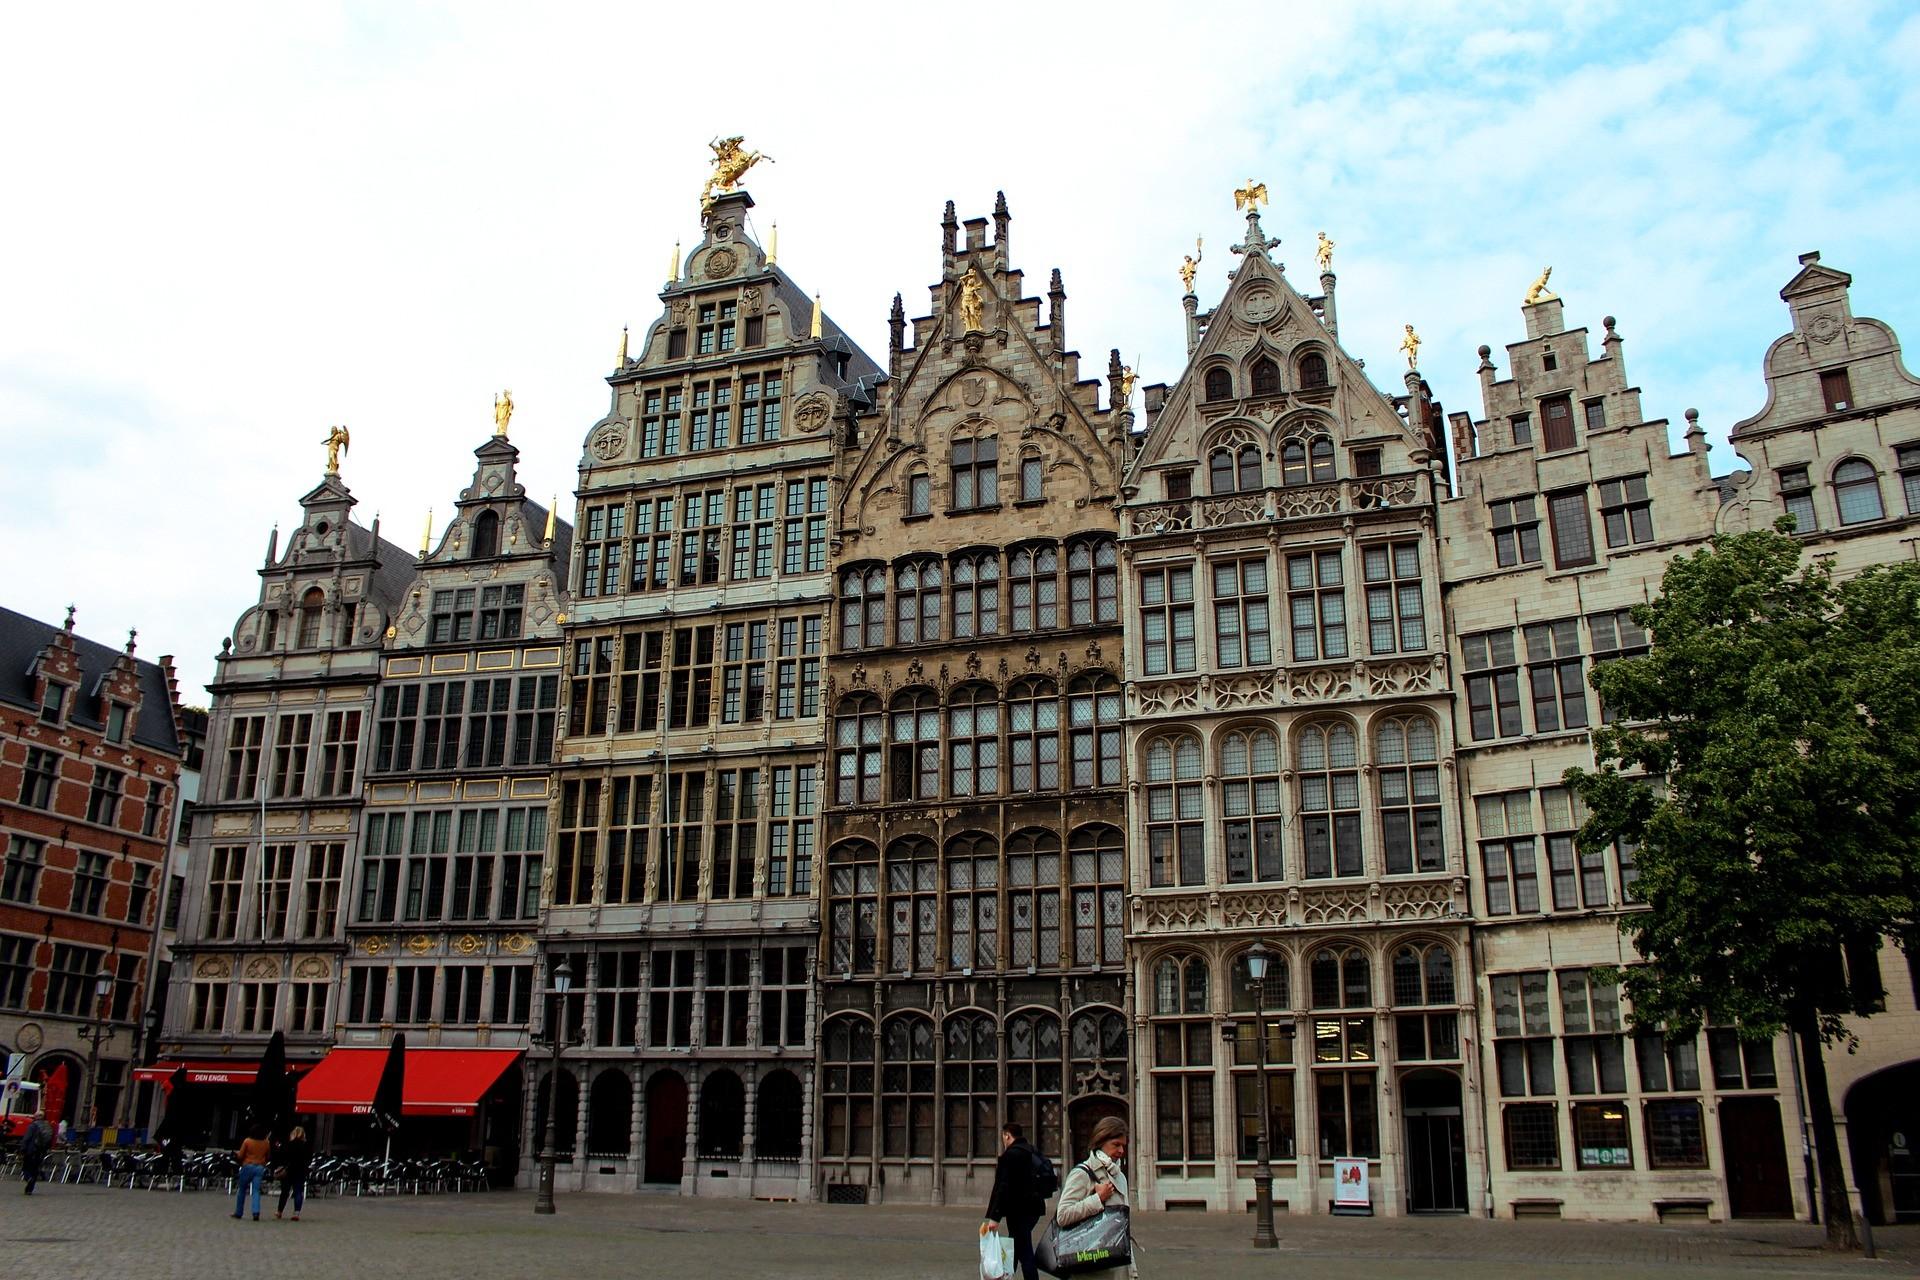 Luoghi di interesse di Anversa: Grote Markt - Foto di reginasphotos